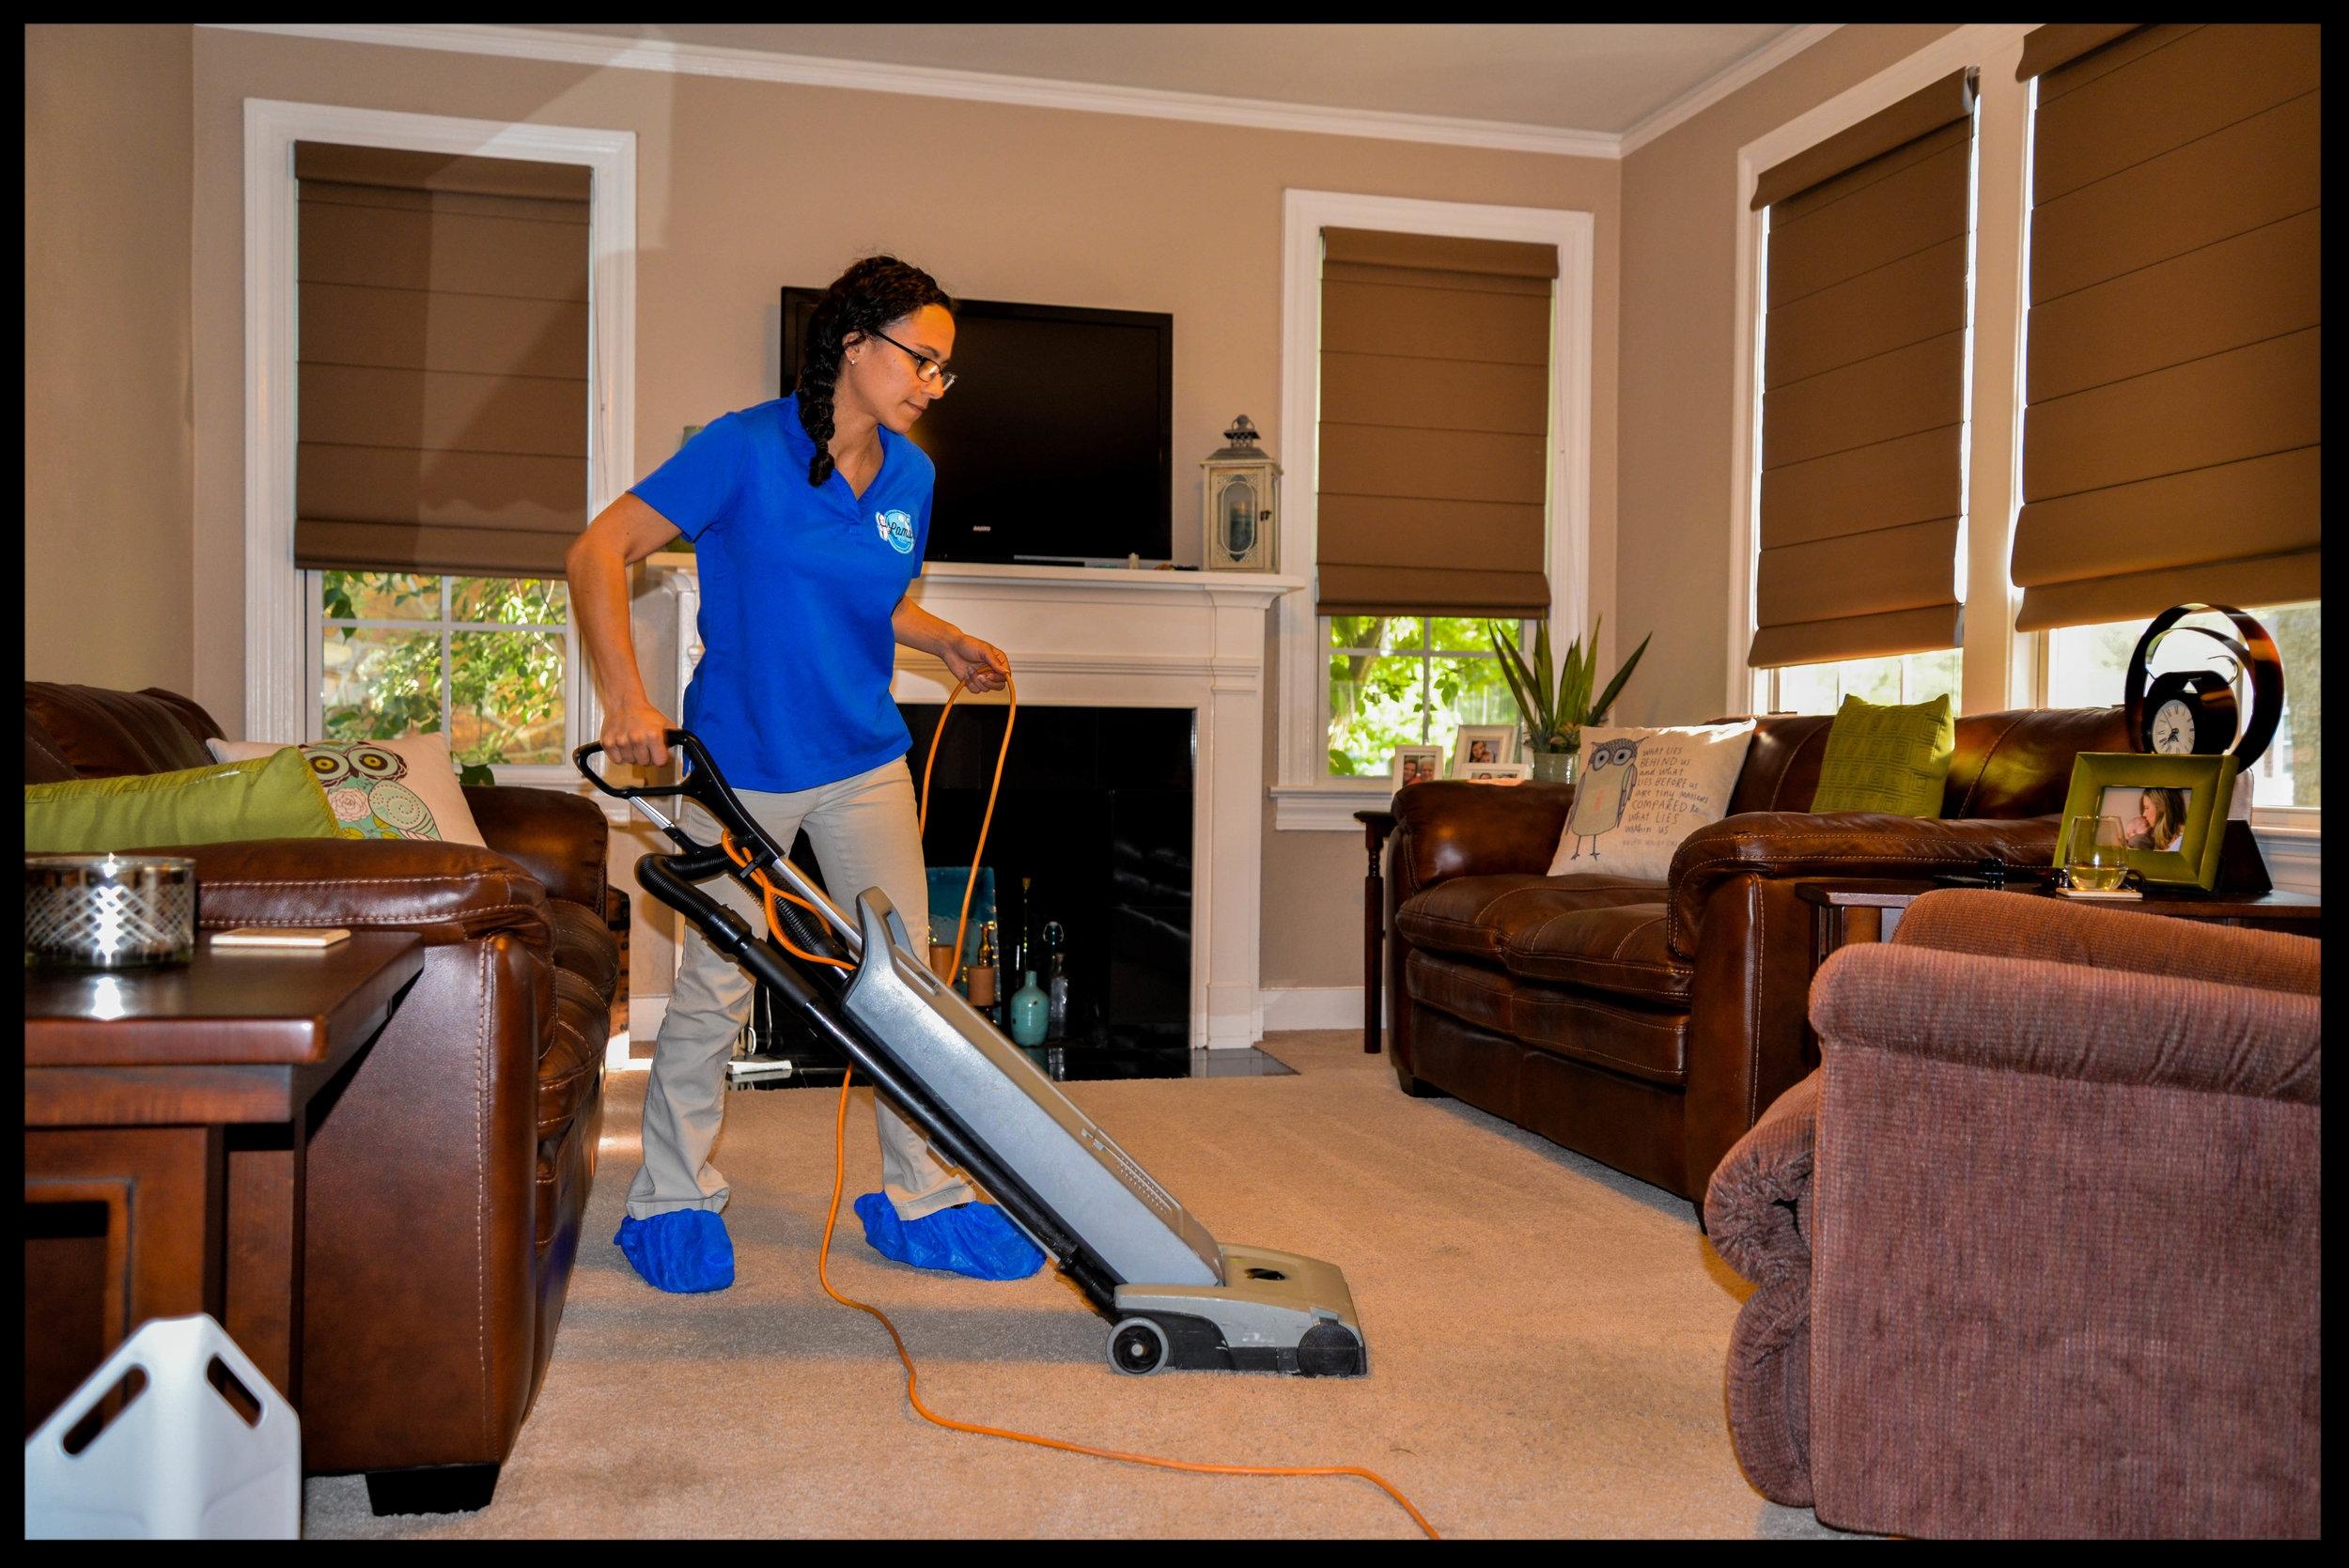 2. Thorough vacuuming